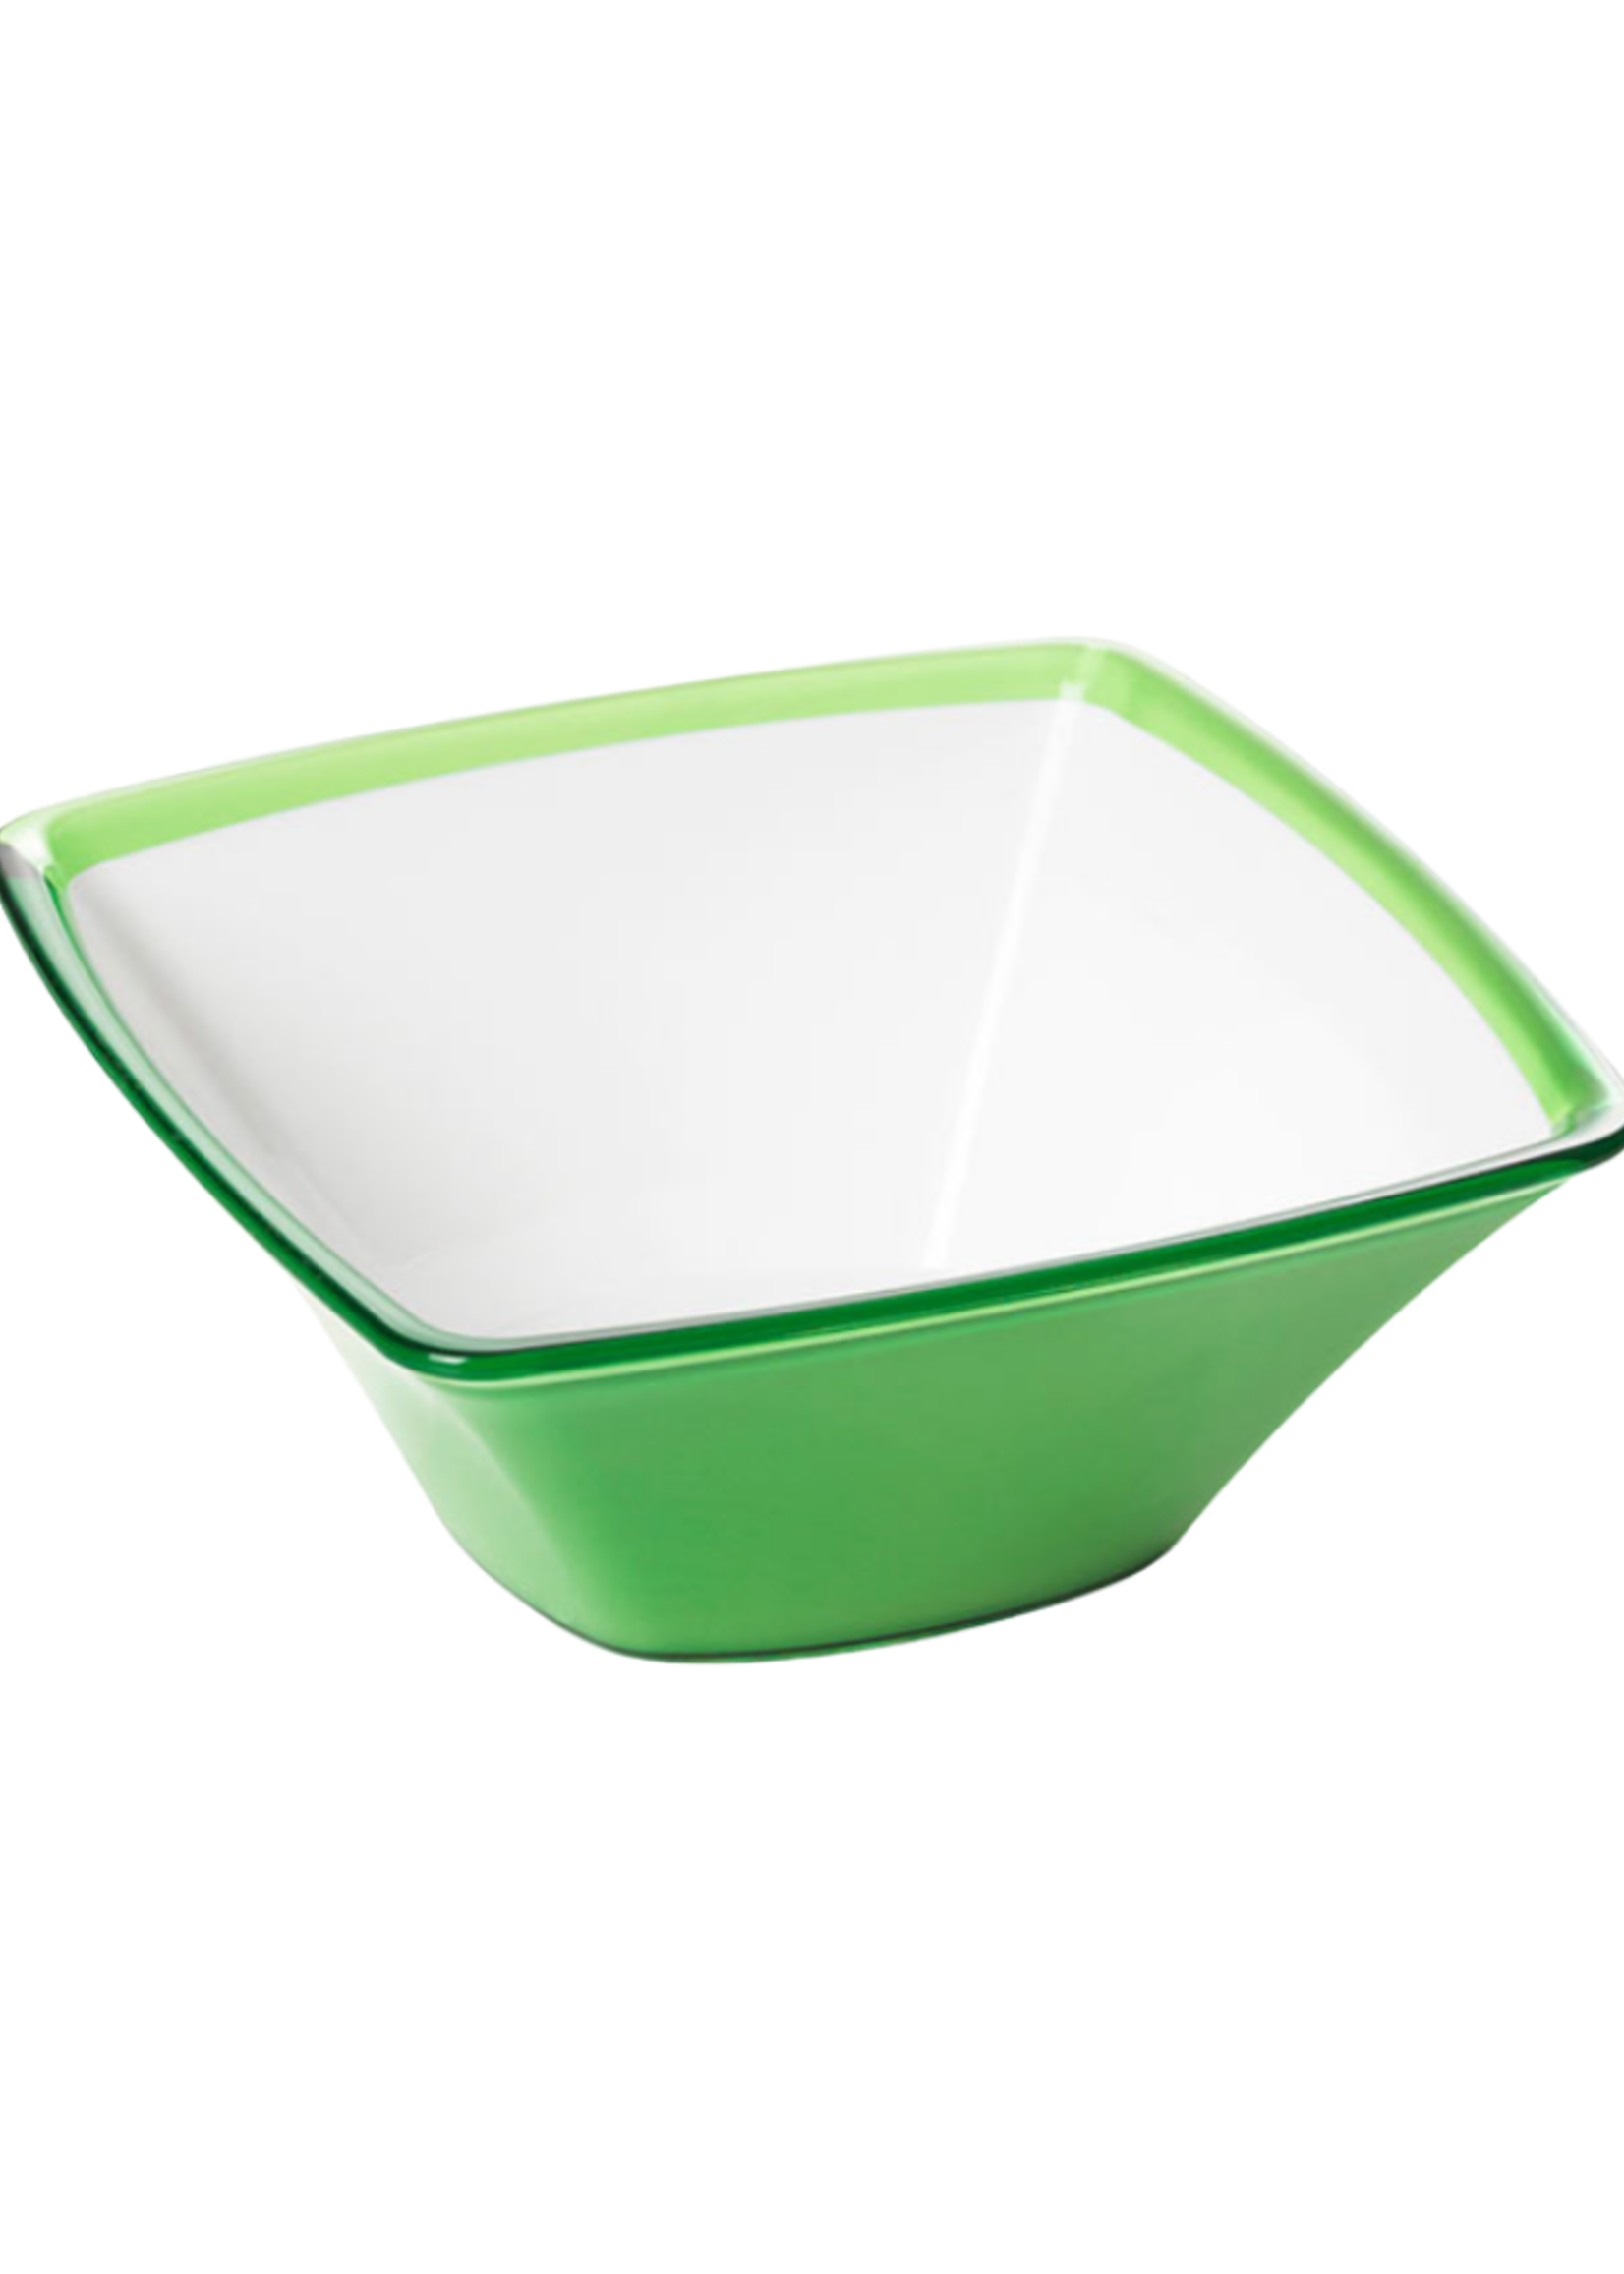 Square Large Acrylic Bowl // Green